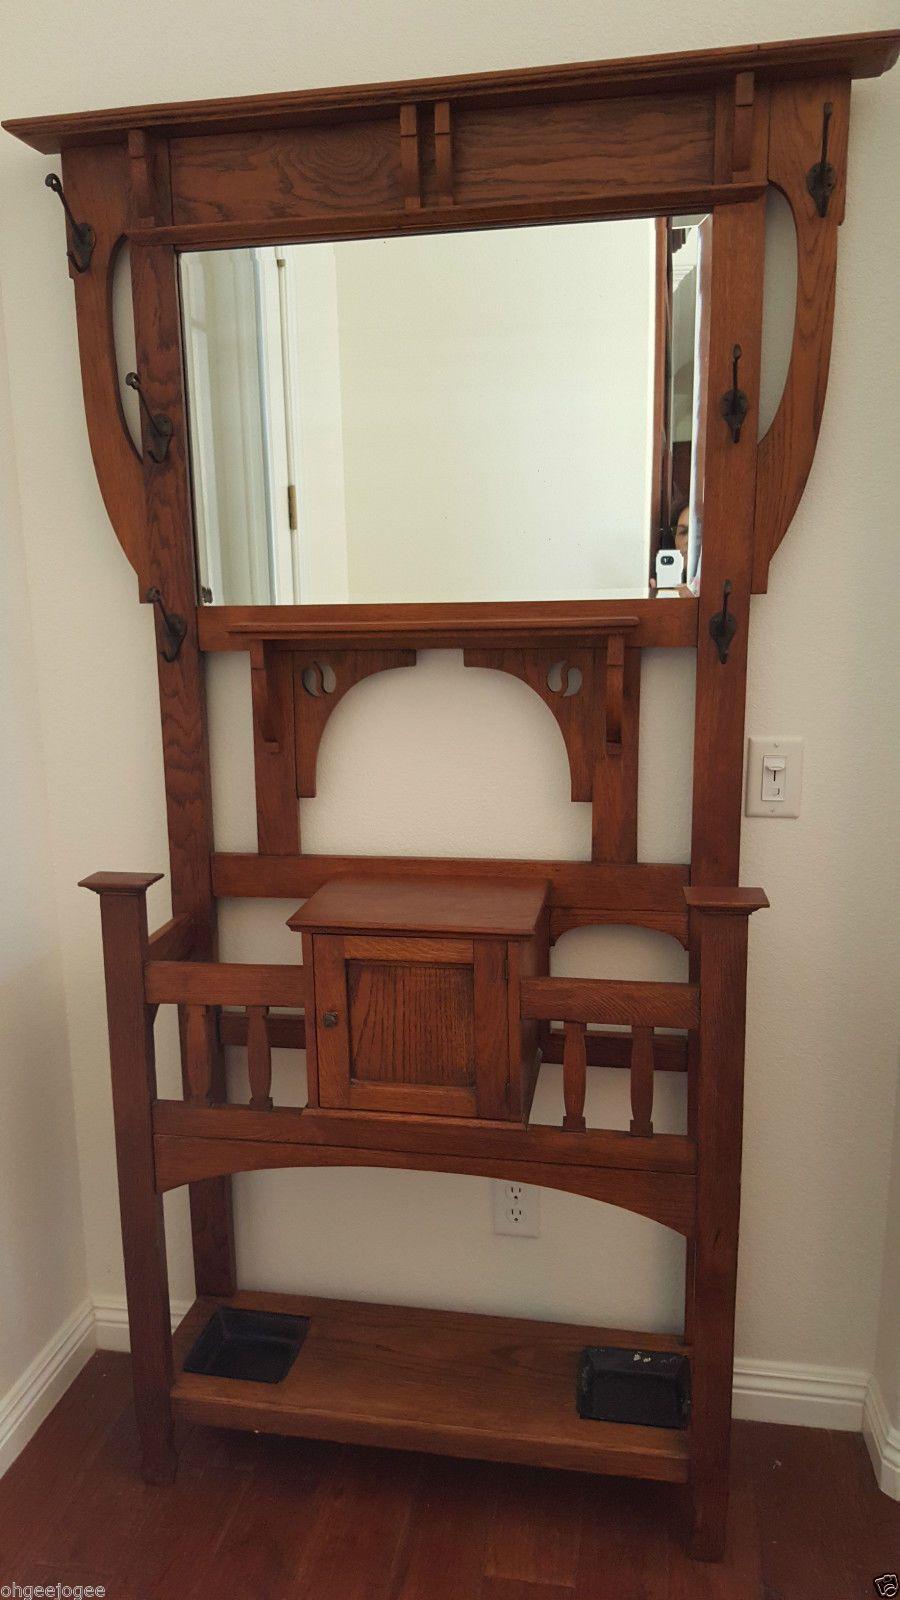 Arts and crafts hall tree - Crated Antique Oak Hall Tree Vintage Umbrella Stand Mission Mirror Arts Craft Ebay